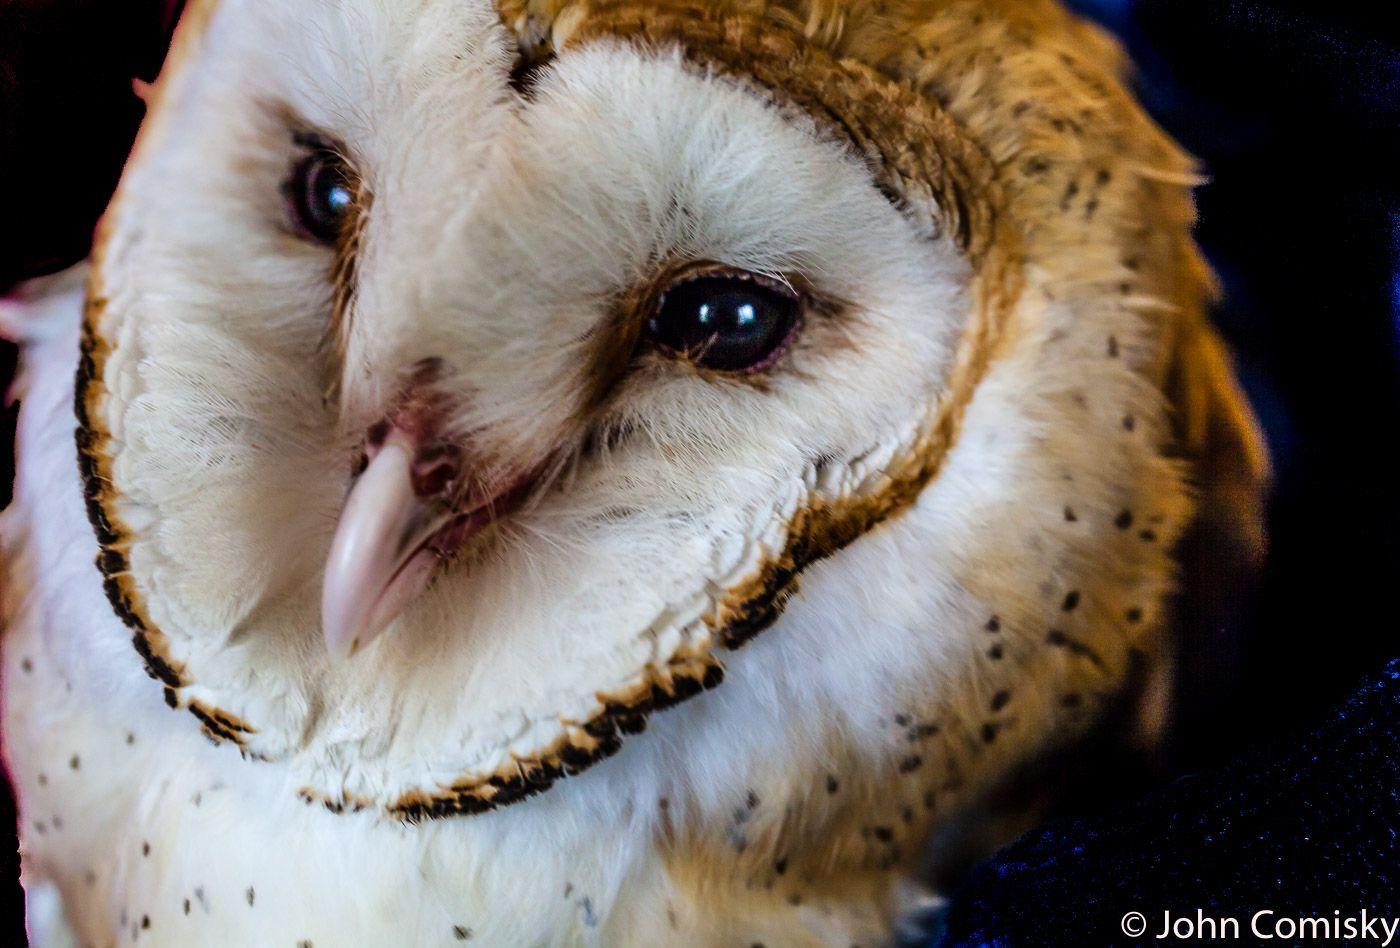 Barn Owl in Rehab Barn owl, Owl, Wild birds